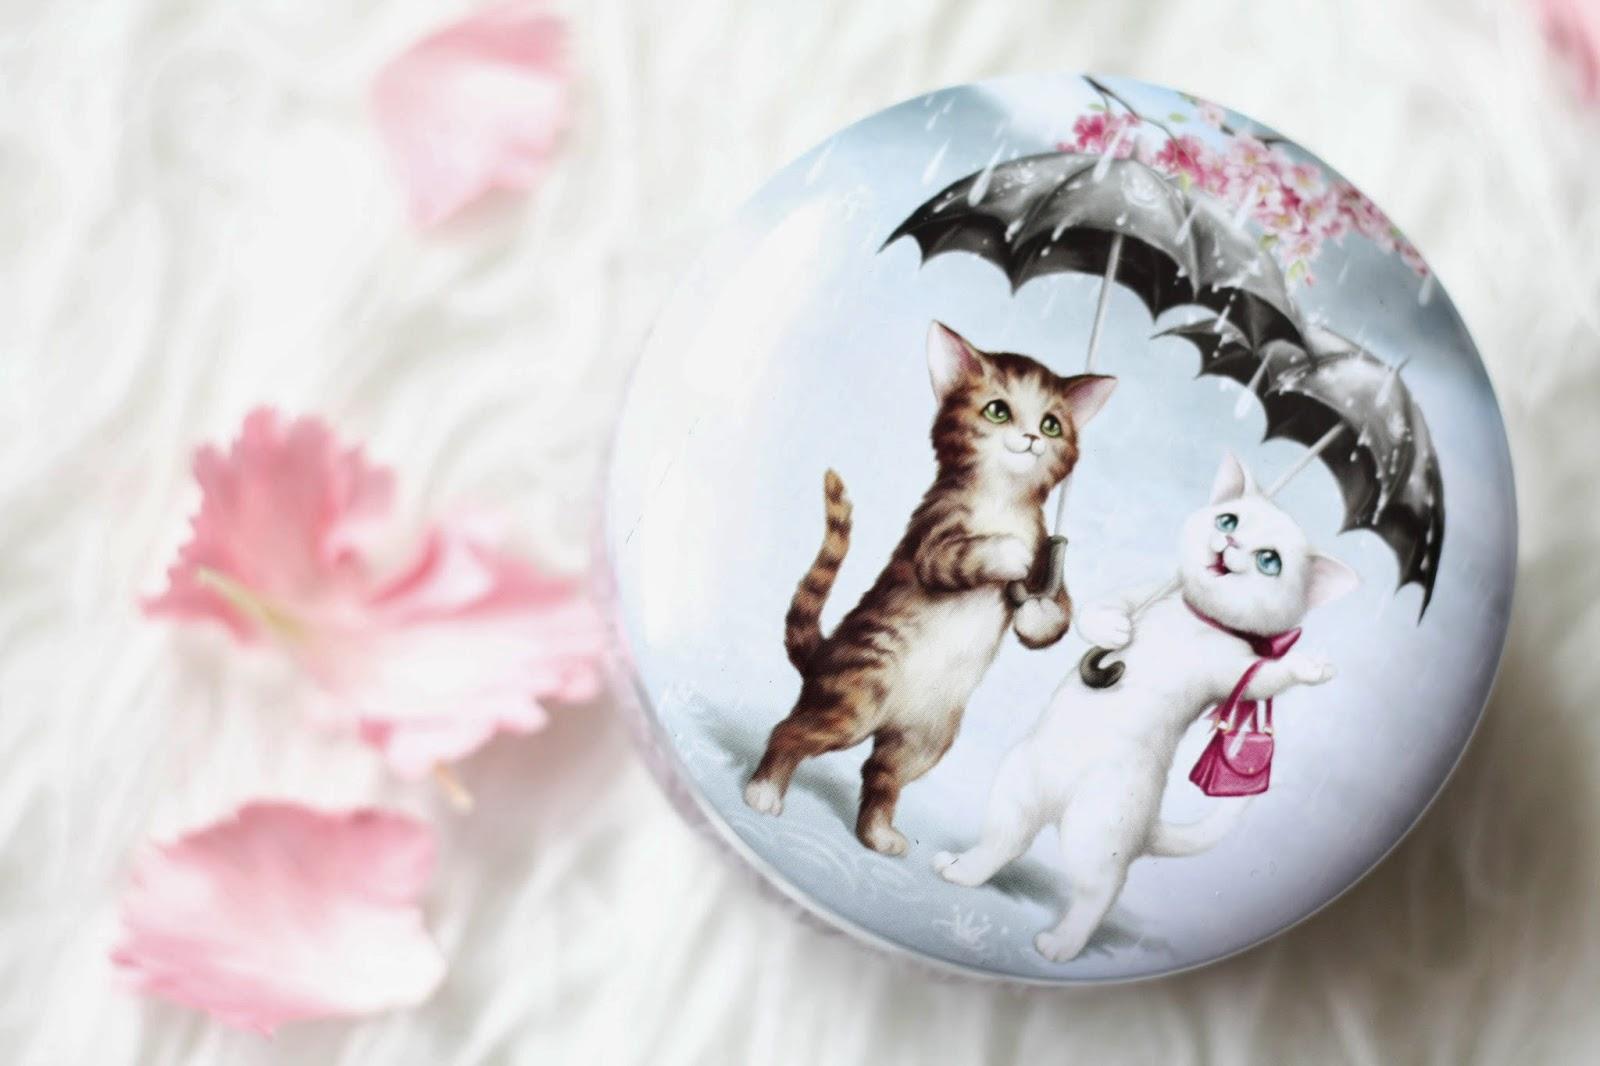 Cute trinket tin with raining cats print from Santoro London